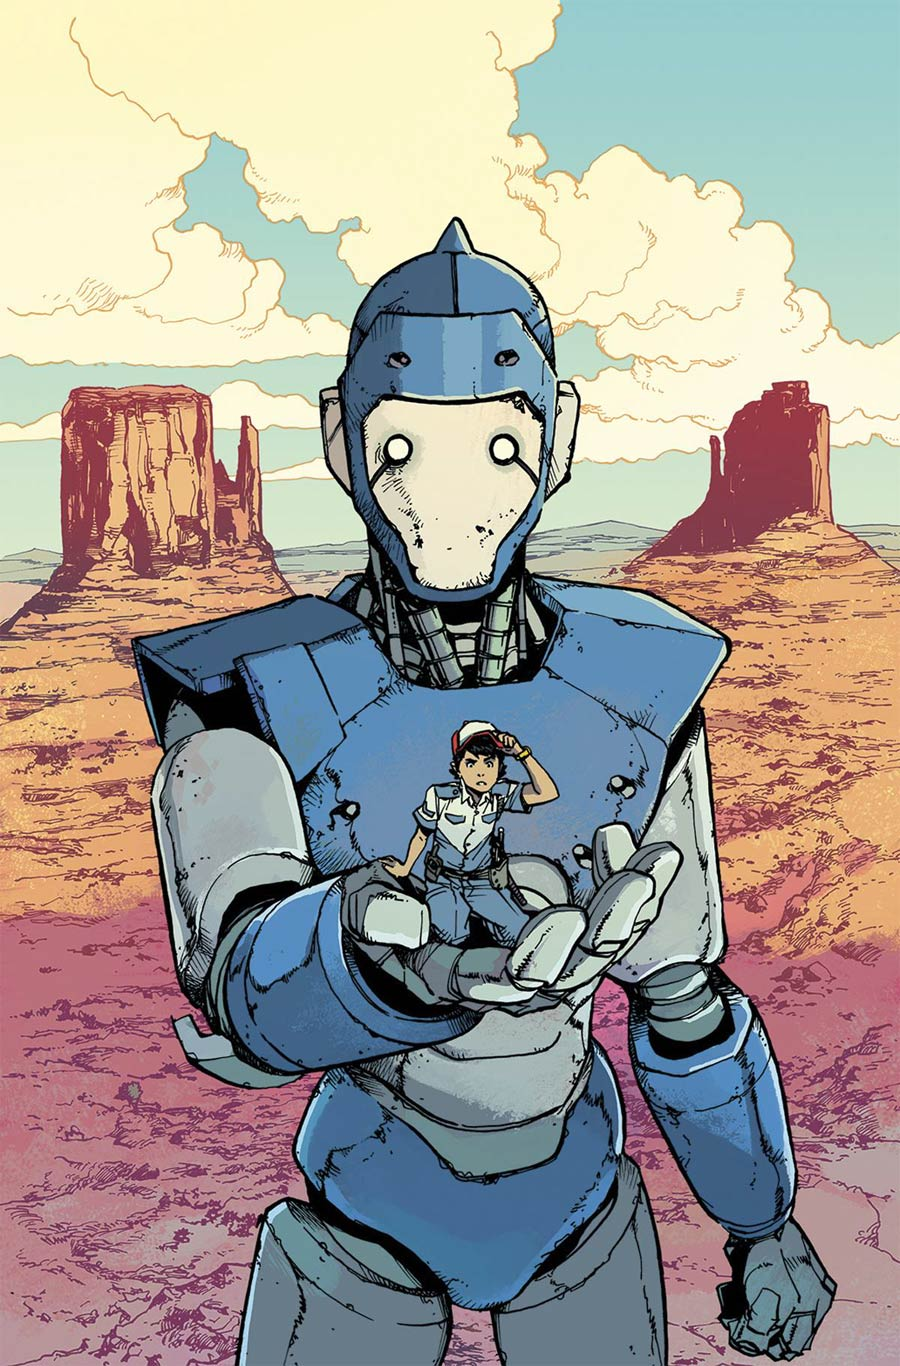 Mech Cadet Yu #1, by Takeshi Miyazawa and Triona Farrell (BOOM! Studios)